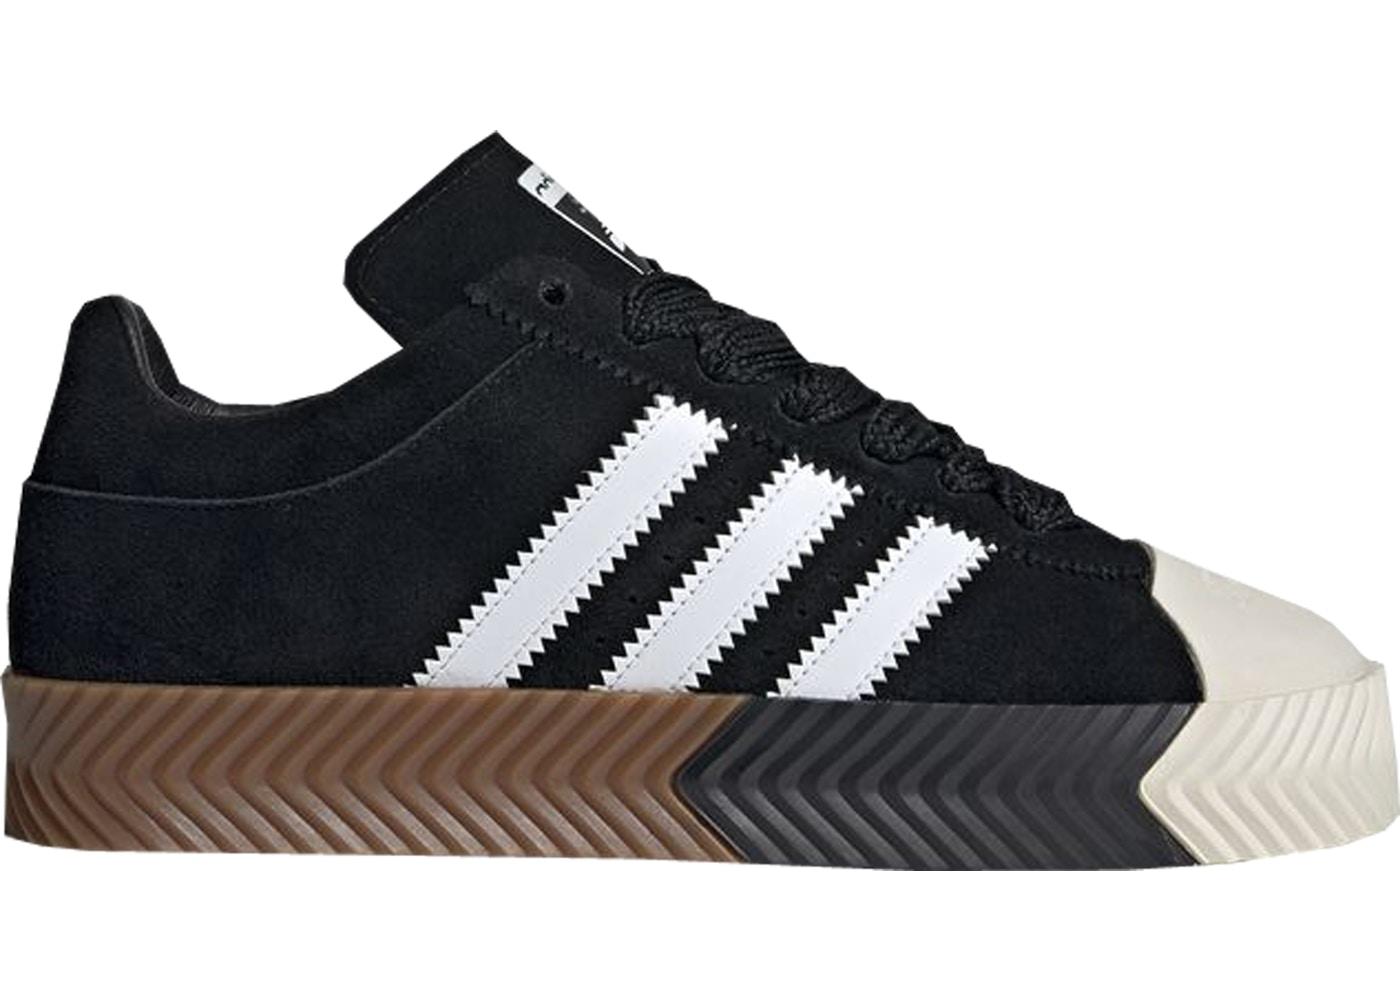 F36640 Adidas Originals Yeezy 500 Running Shoes Utility Black